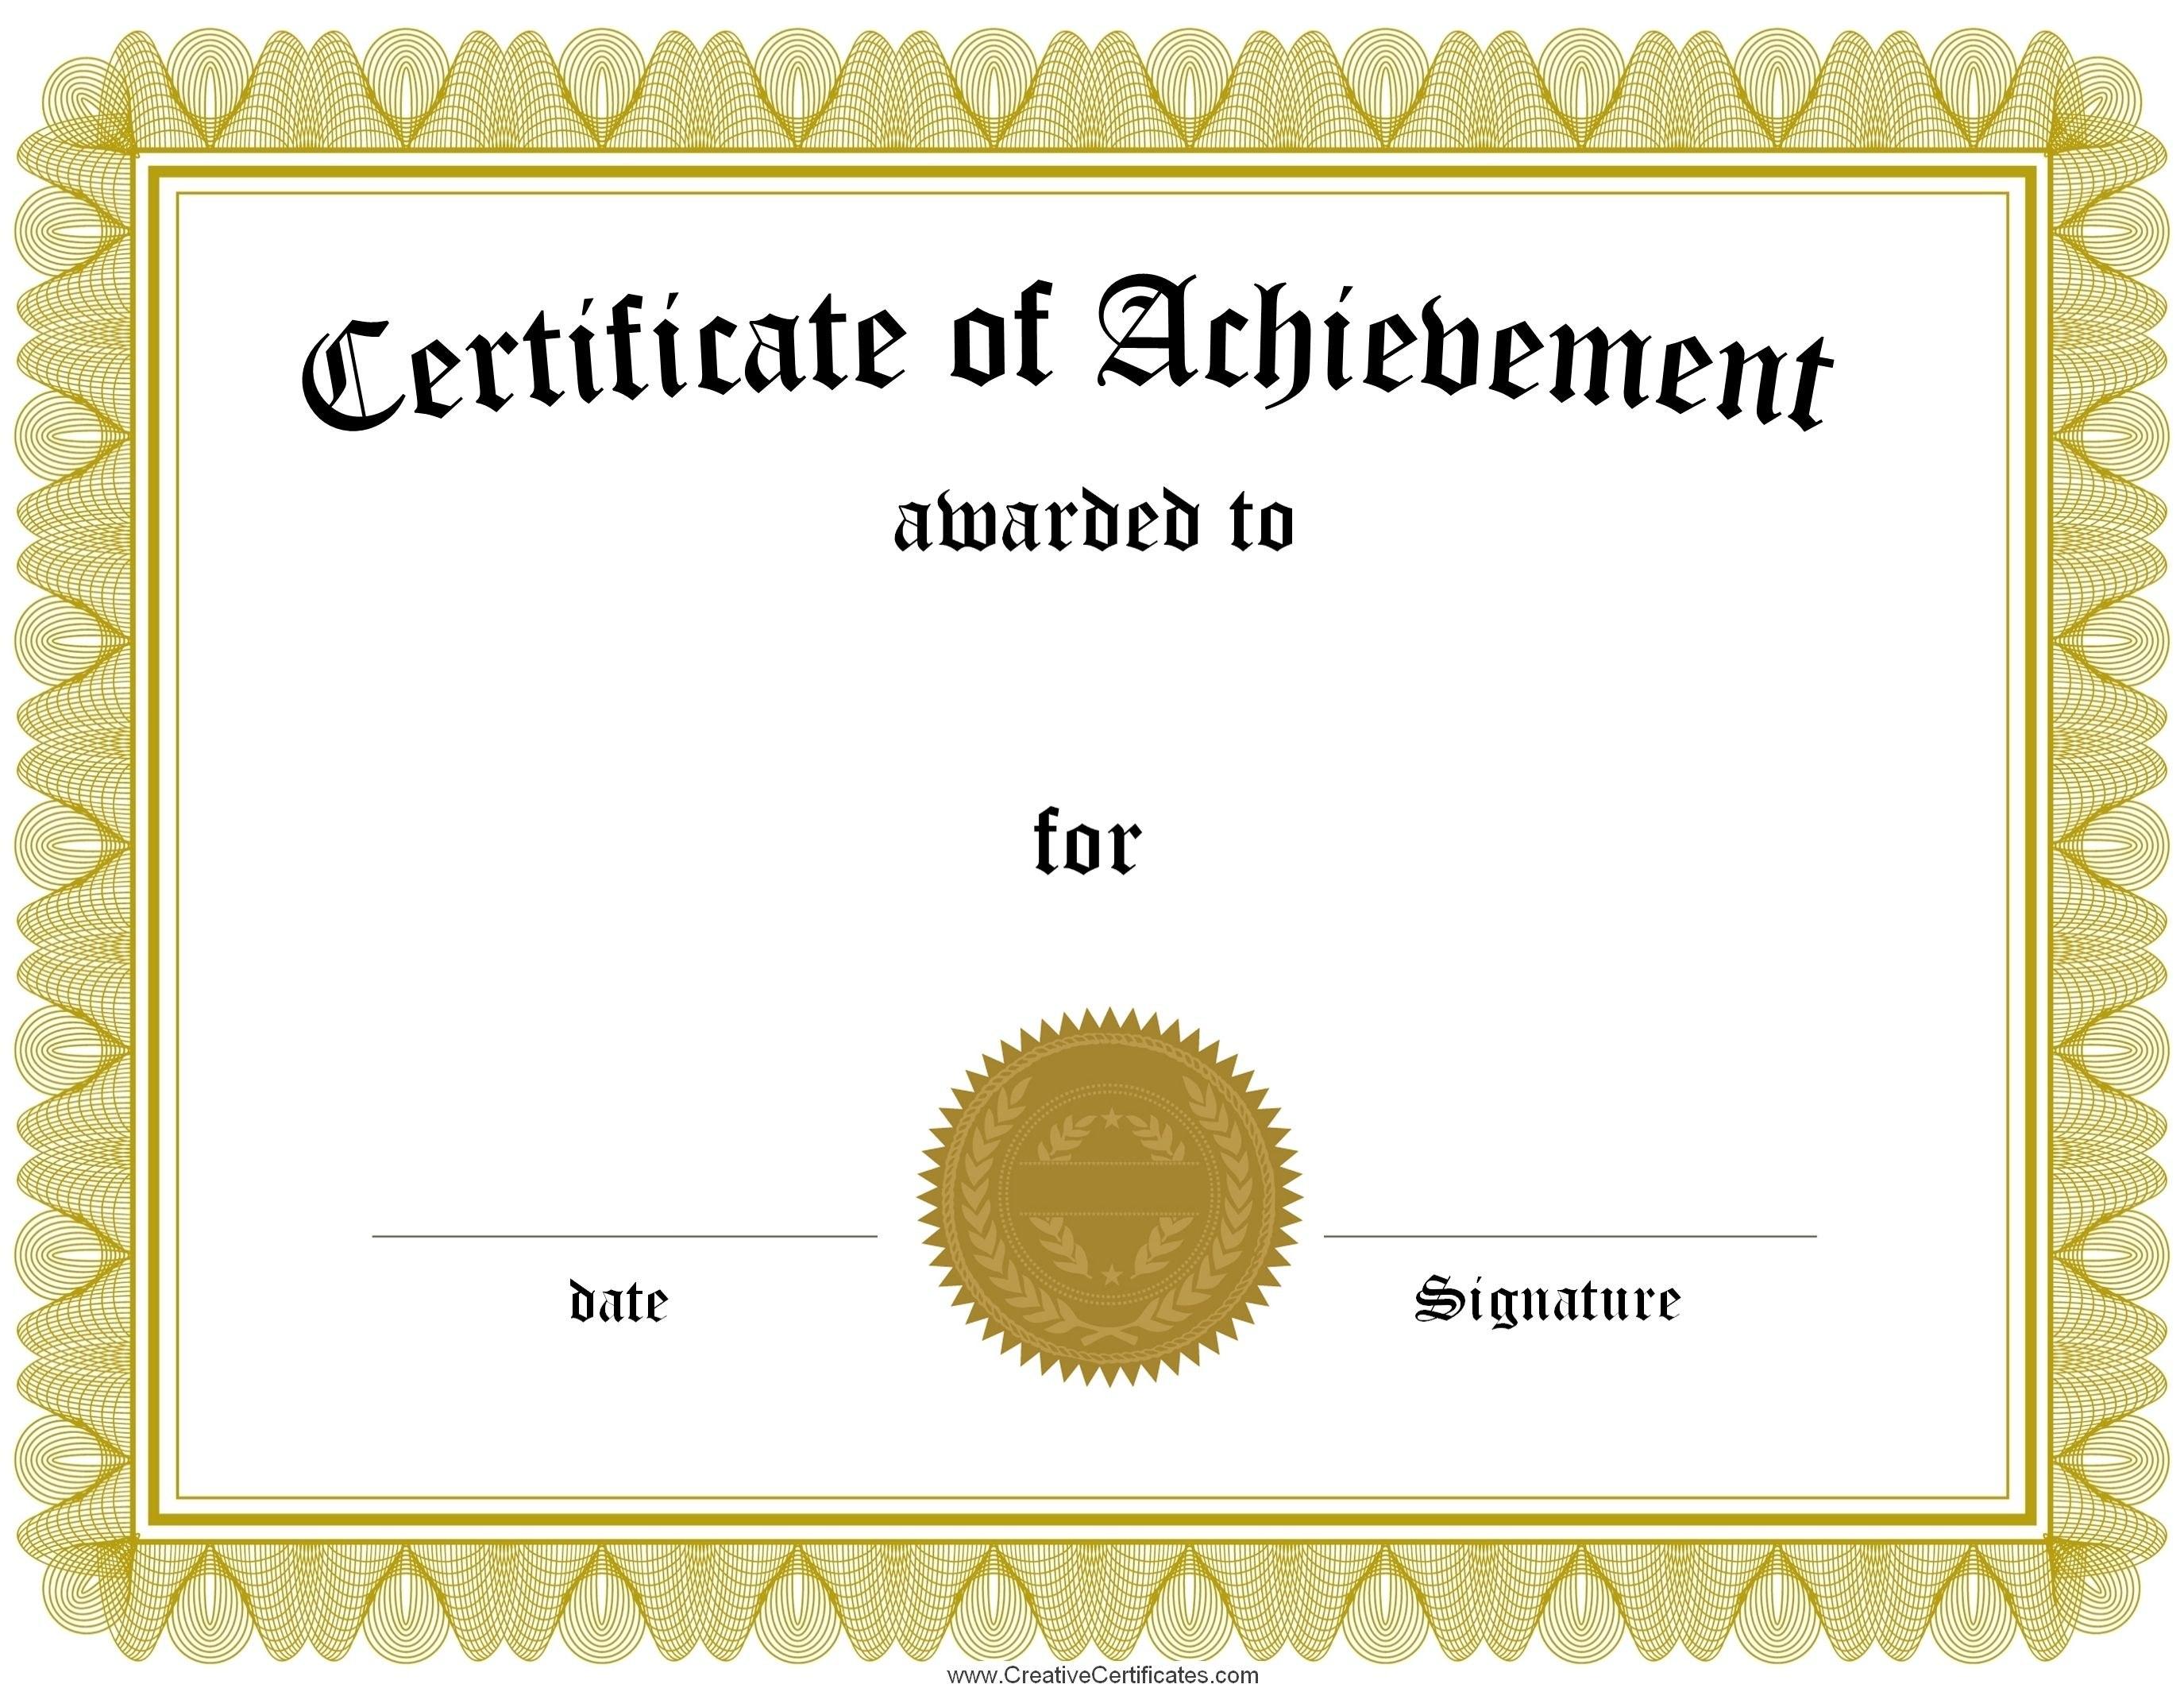 Award Certificate Template Certificate Templates Best Free Images In Generic Certificate Template